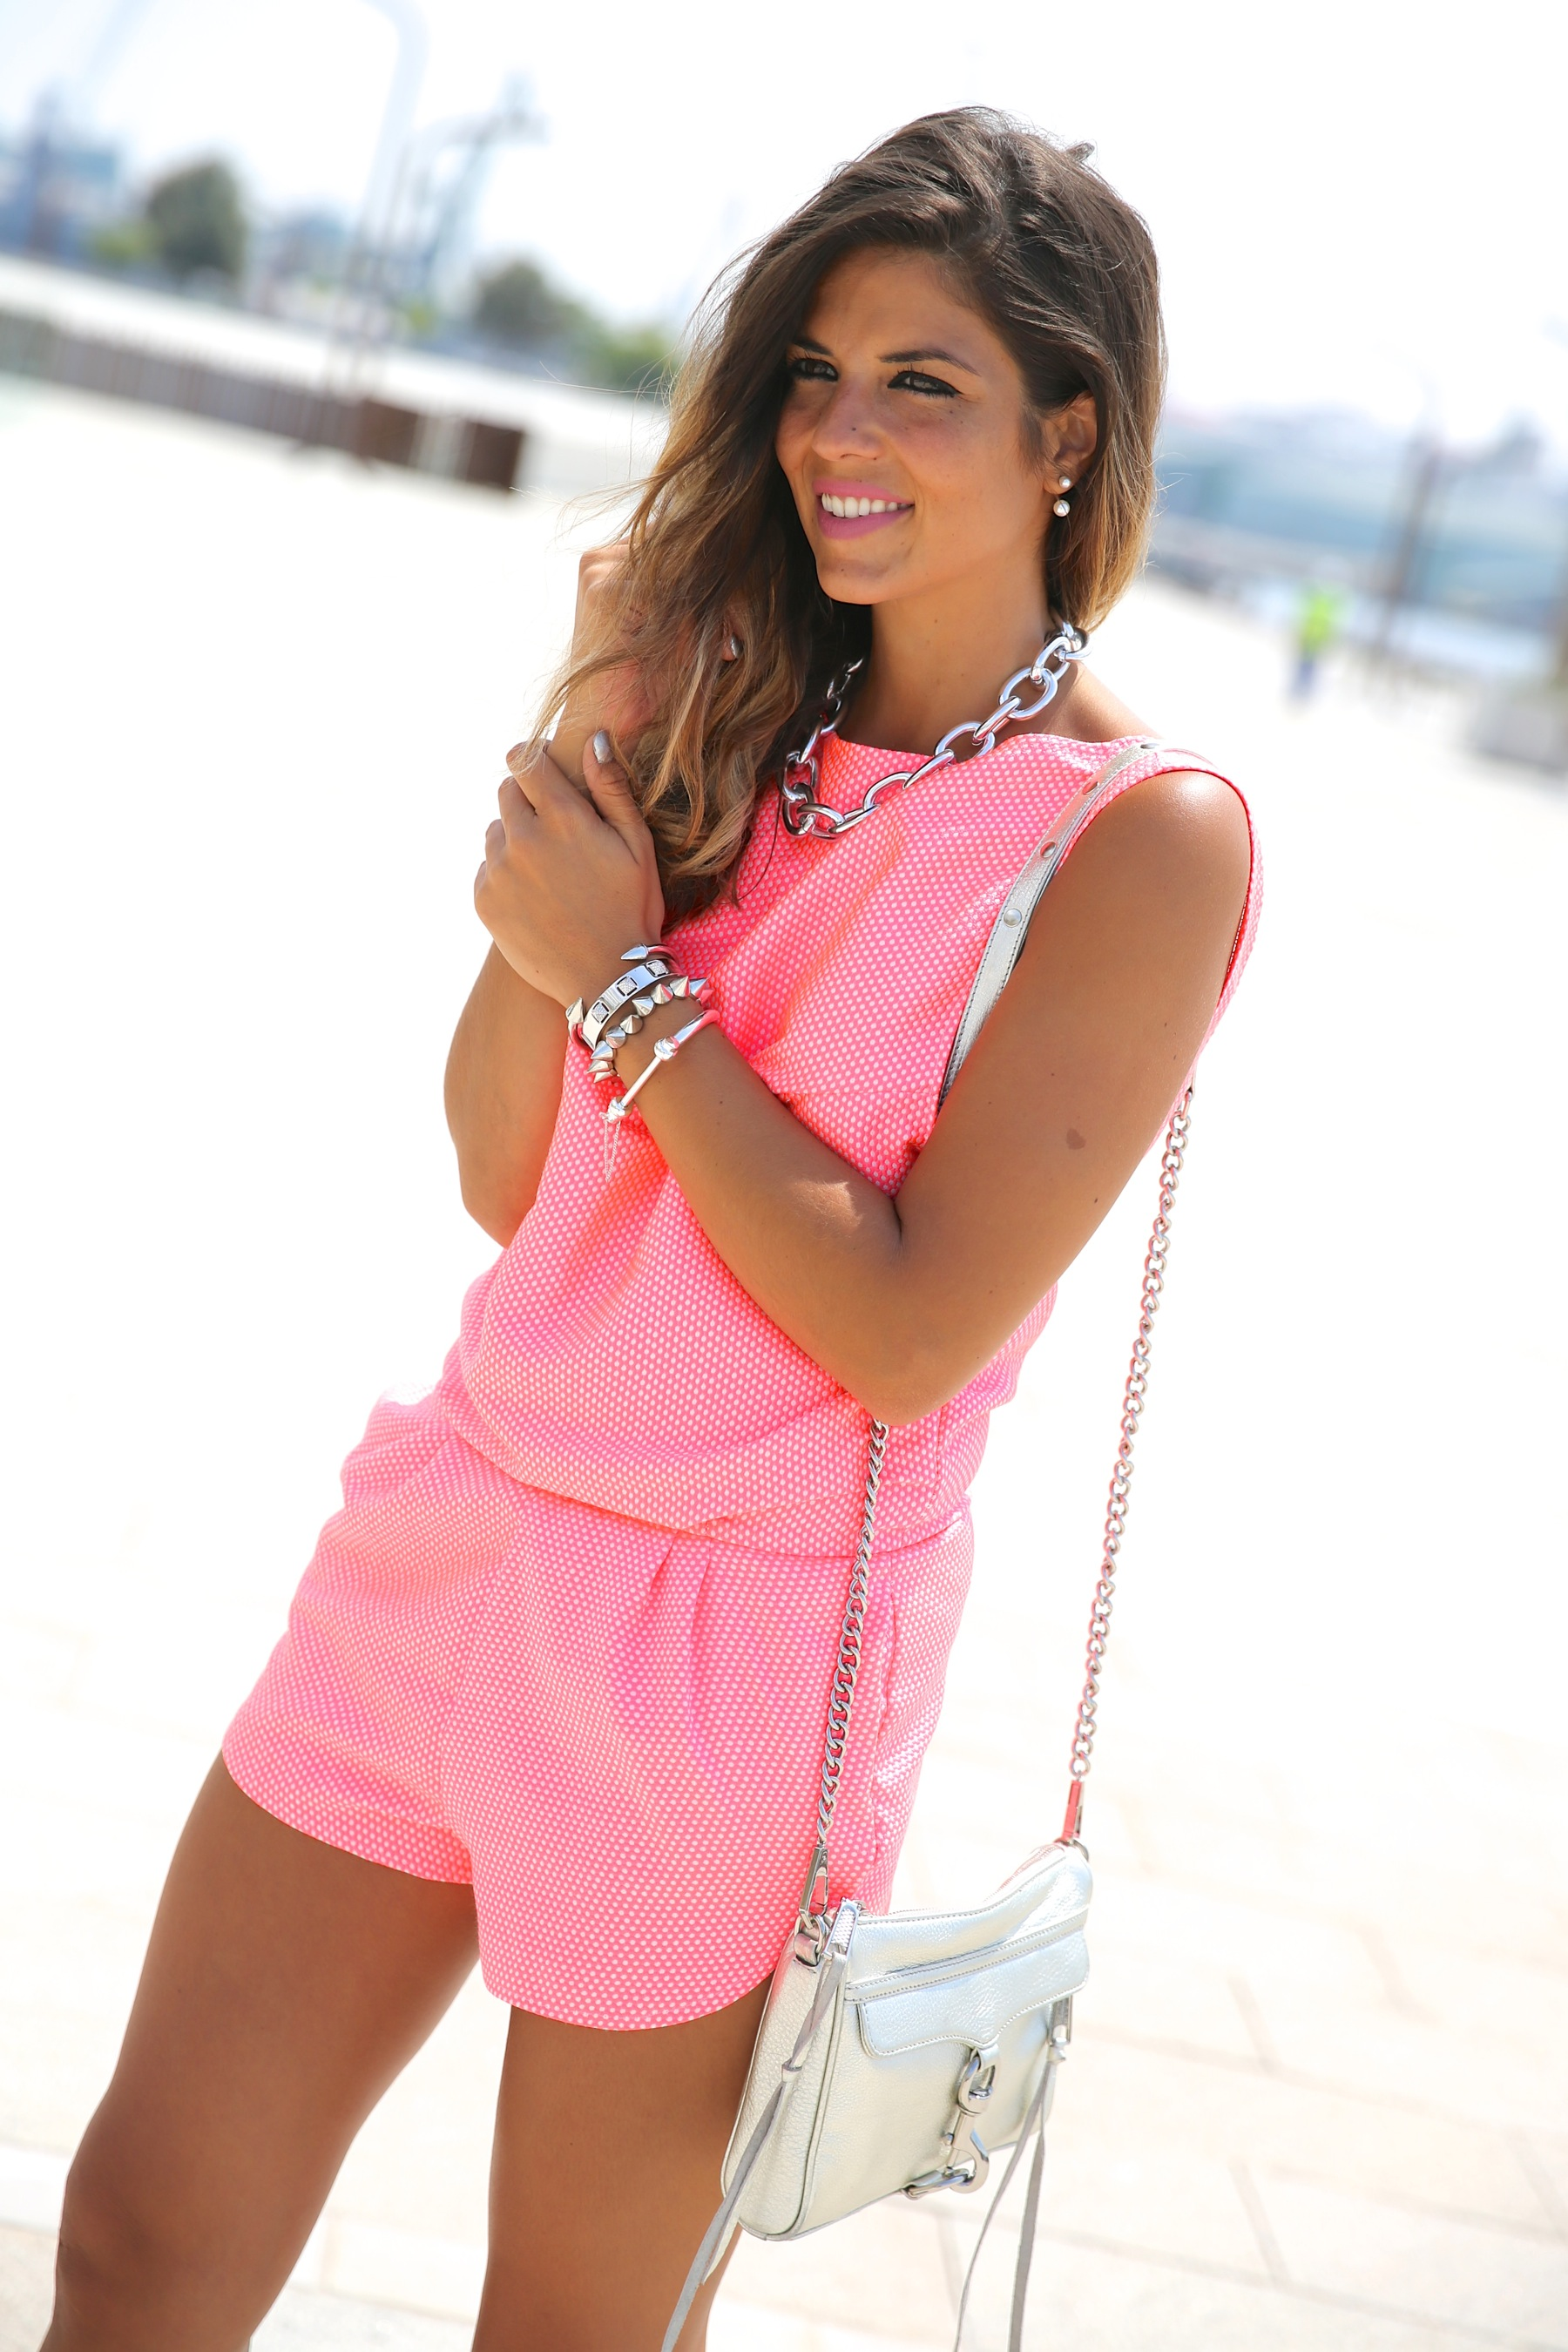 trendy_taste-look-outfit-street_style-ootd-blog-blogger-fashion_spain-moda_españa-silver_bag-bolso_plata-mono_rosa-mekdes-coruña-marina-5